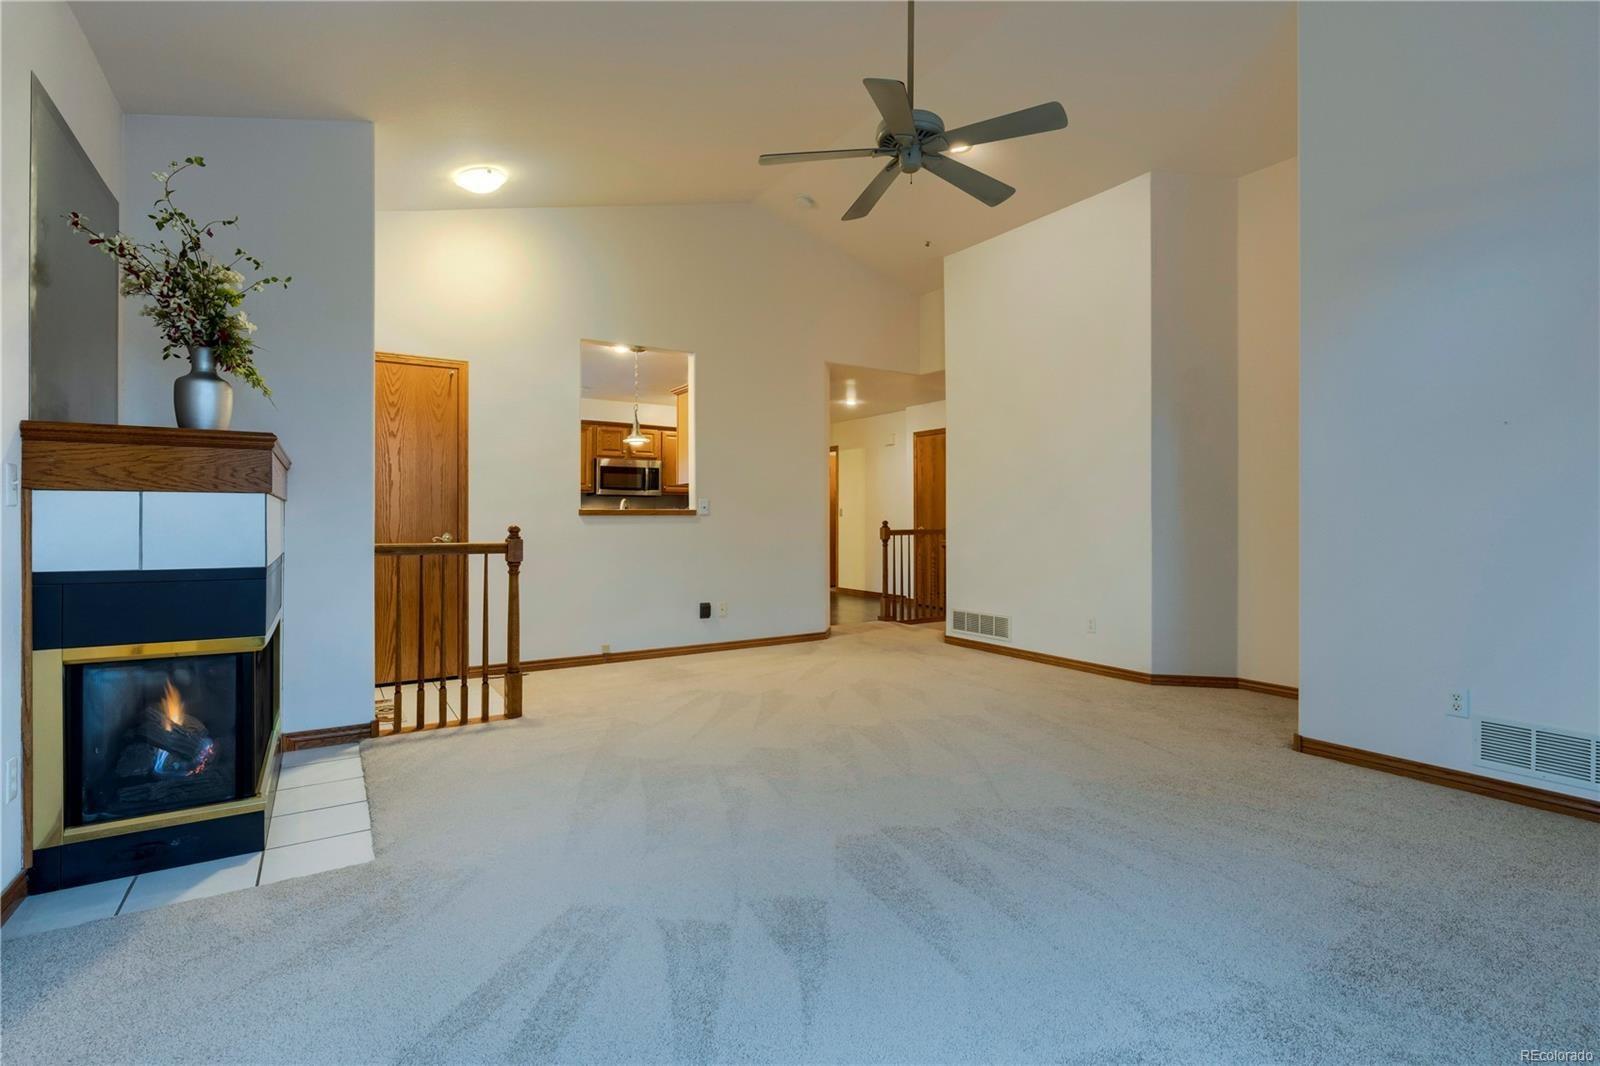 MLS# 7511958 - 6 - 900 Arbor Avenue #6, Fort Collins, CO 80526